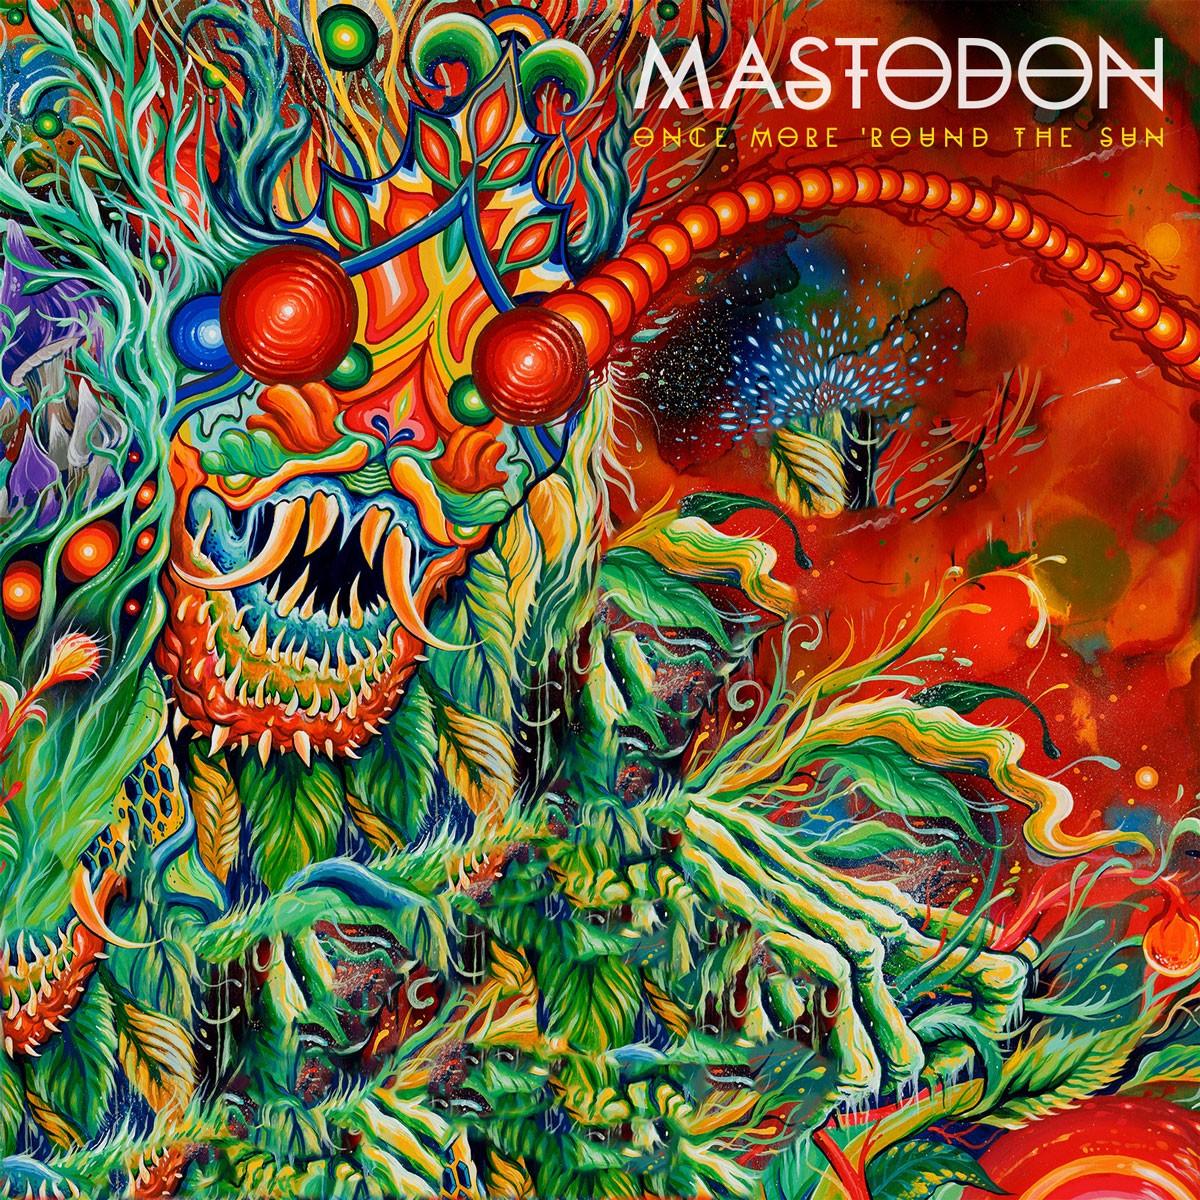 Mastodon cover